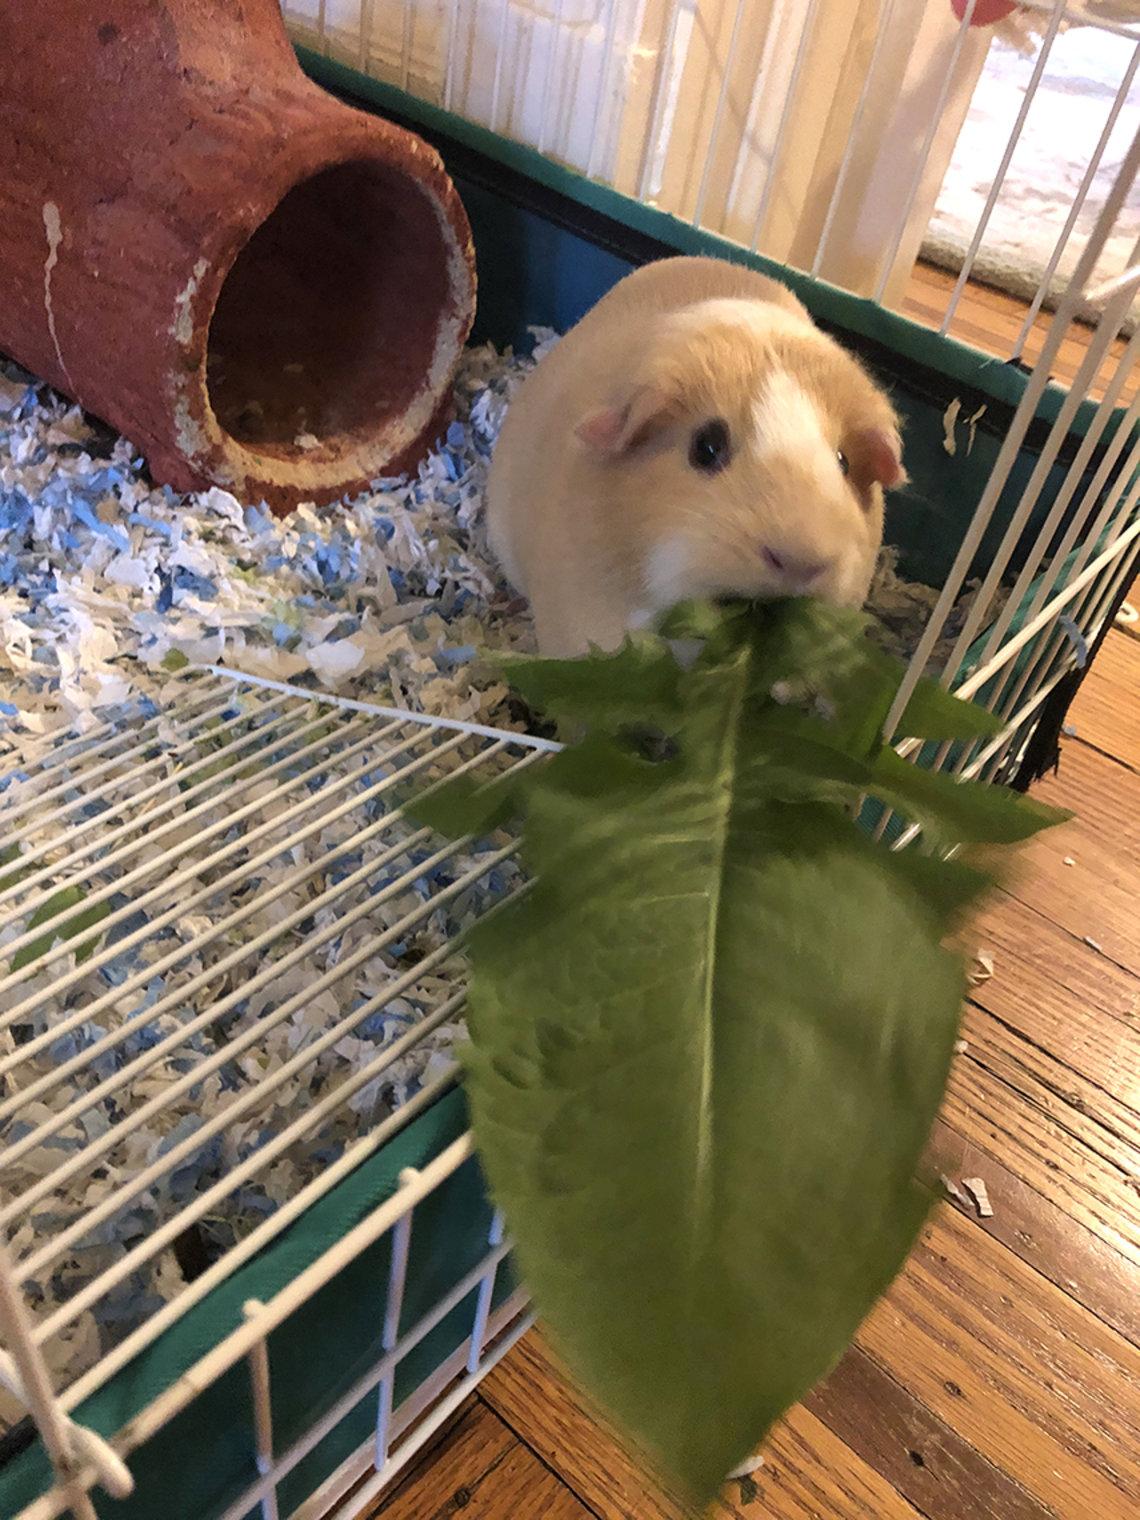 Guinea pig eats a leaf.